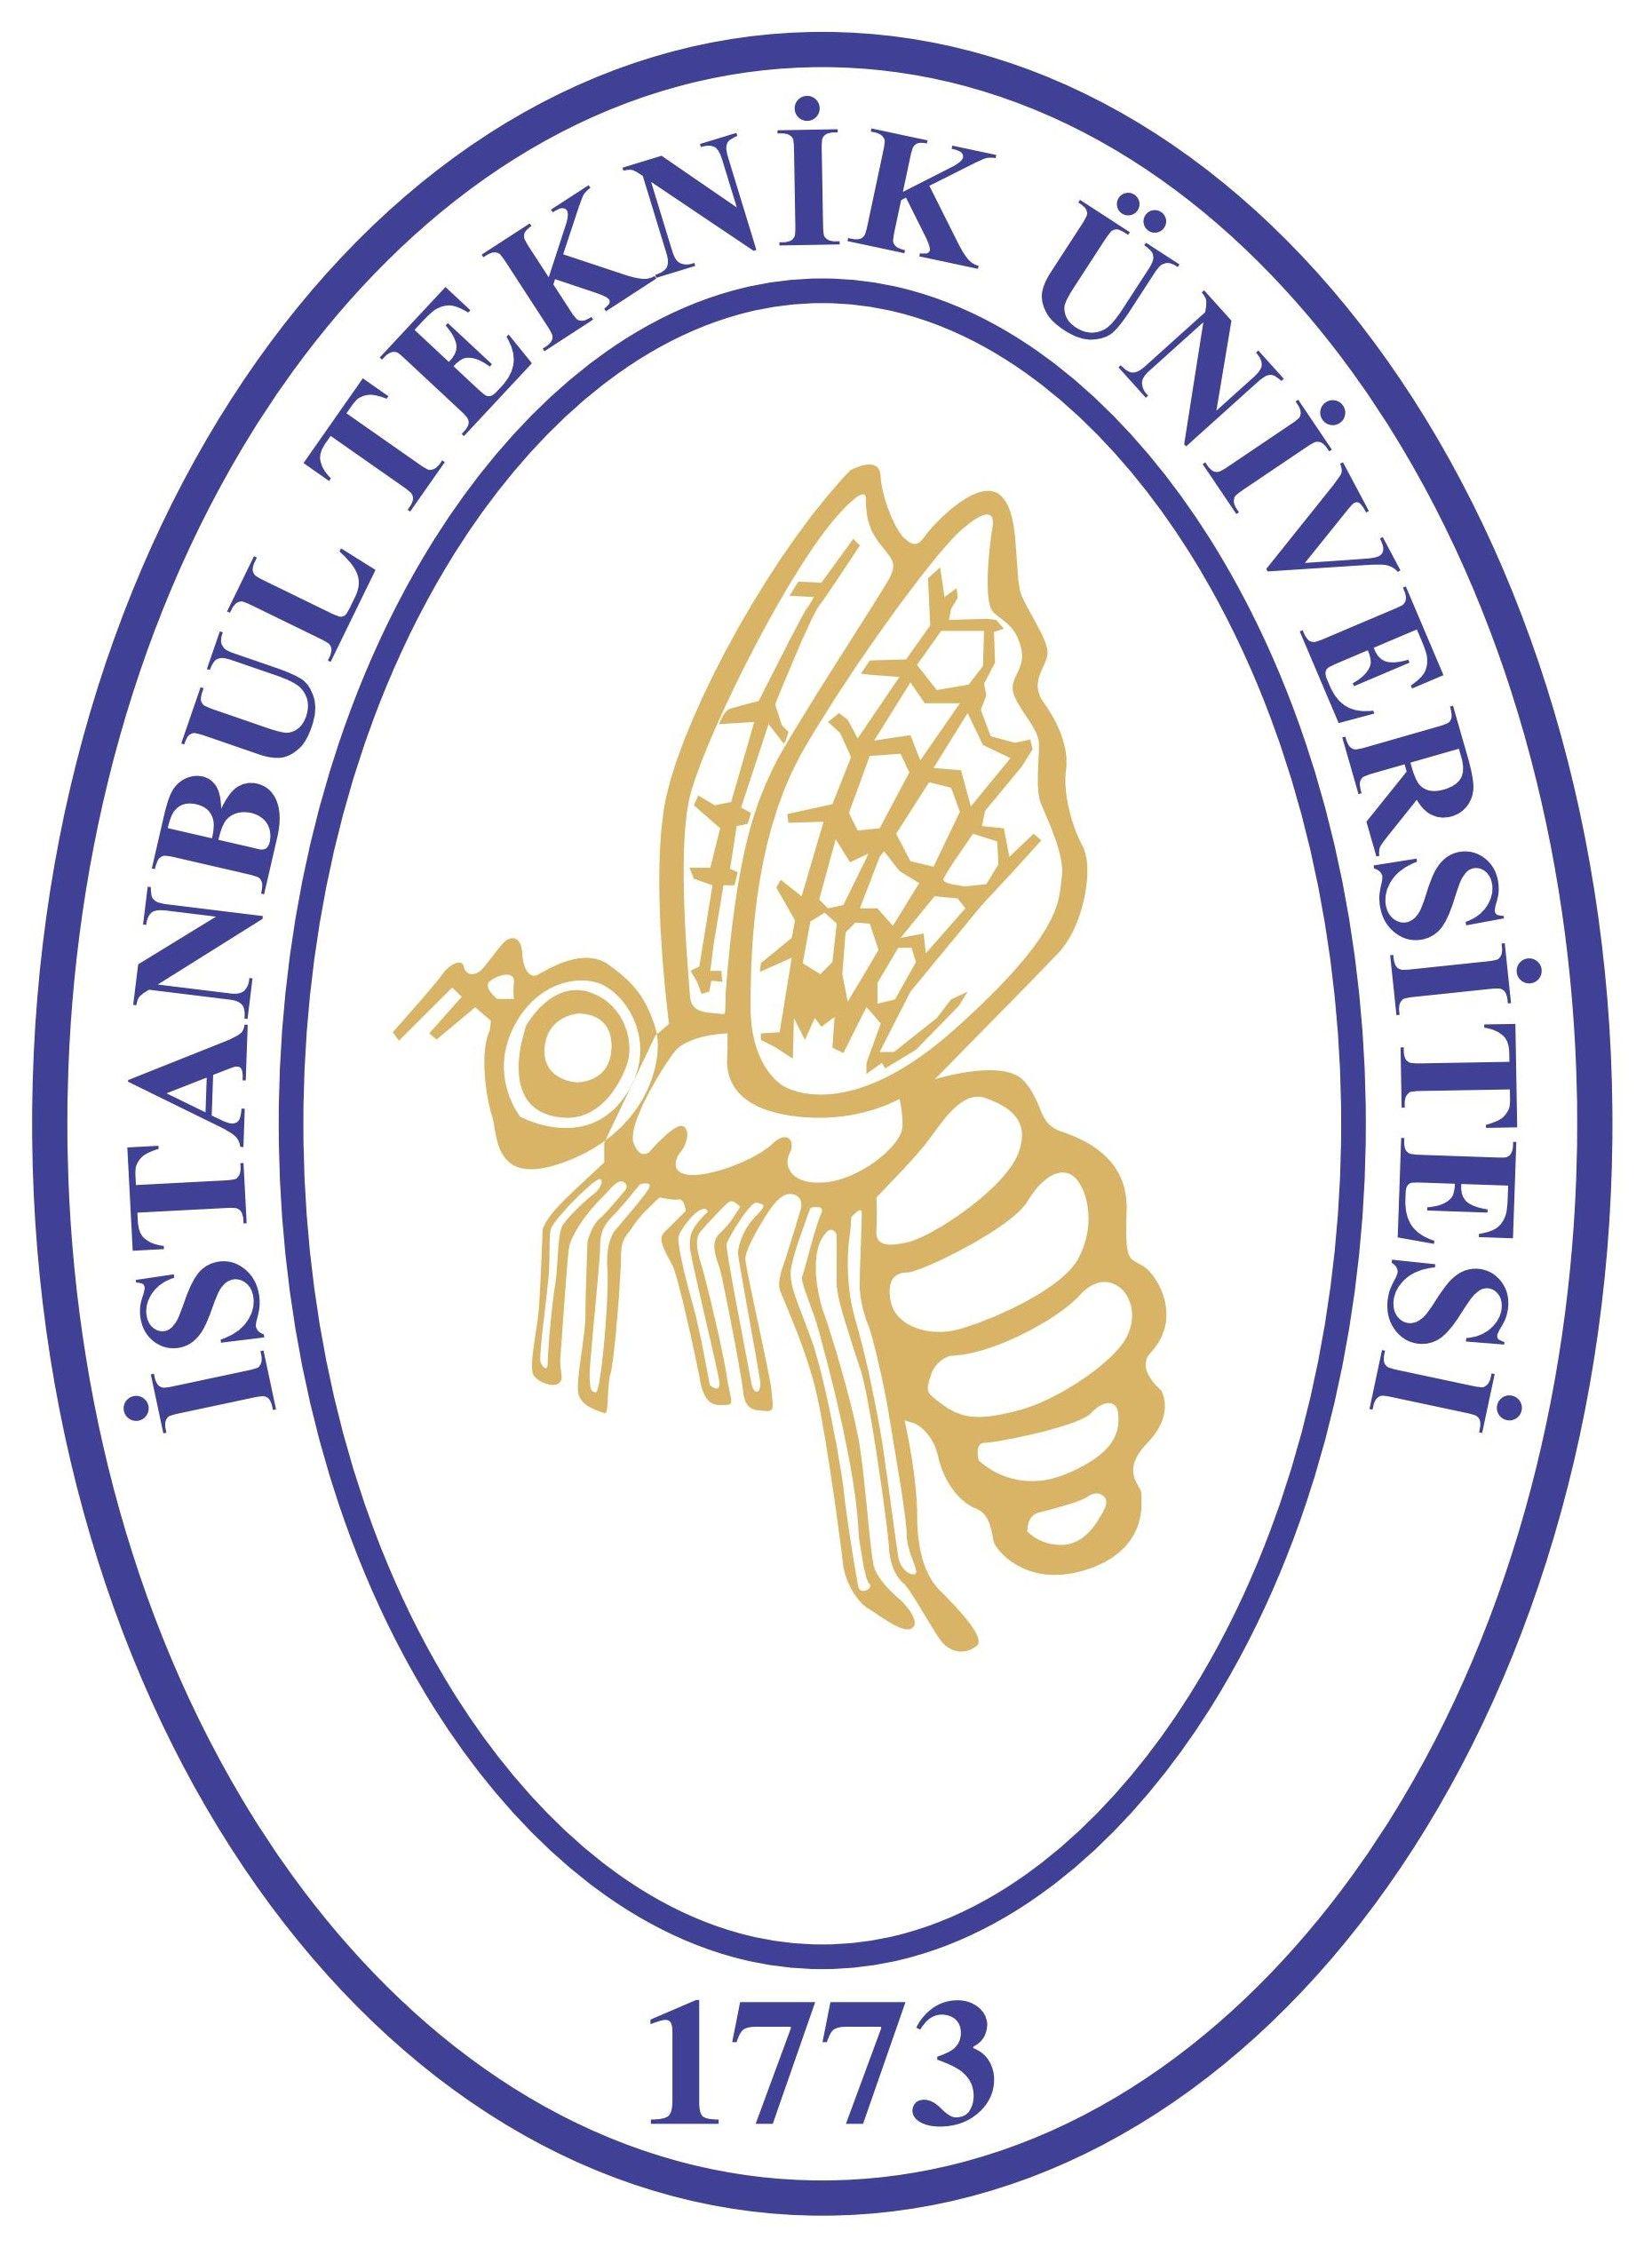 Itu Istanbul Teknik Universitesi Vektorel Logosu Eps Pdf Istanbul Technical University Logolar Teknik Istanbul